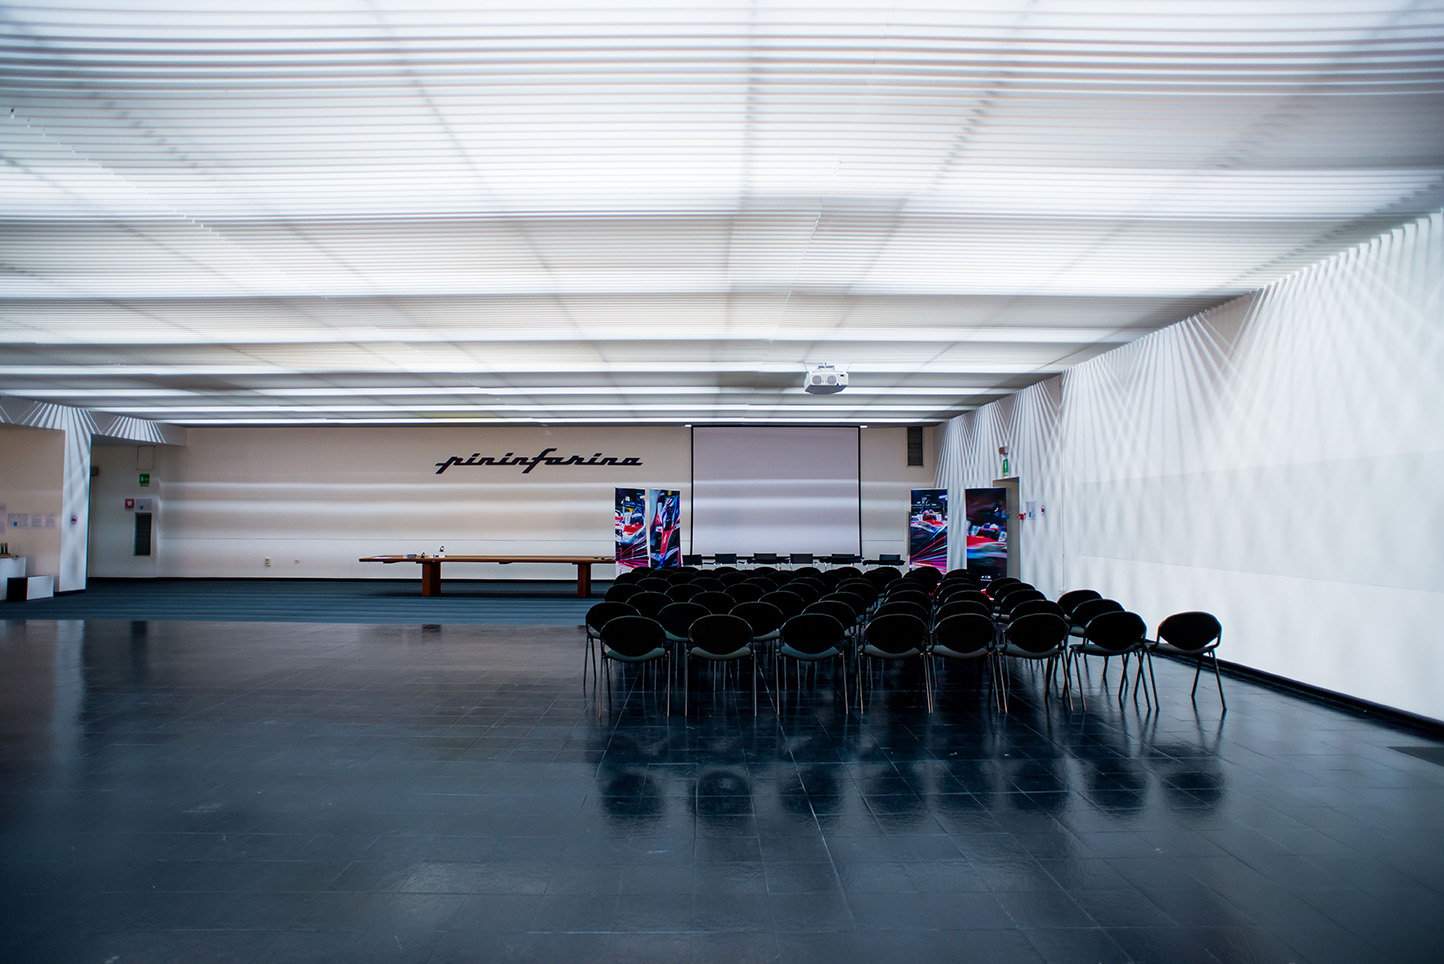 Spacesuit-Media-Marta-Rovatti-Studihrad-FIA-Formula-E-Mahindra-2018_MRS7009